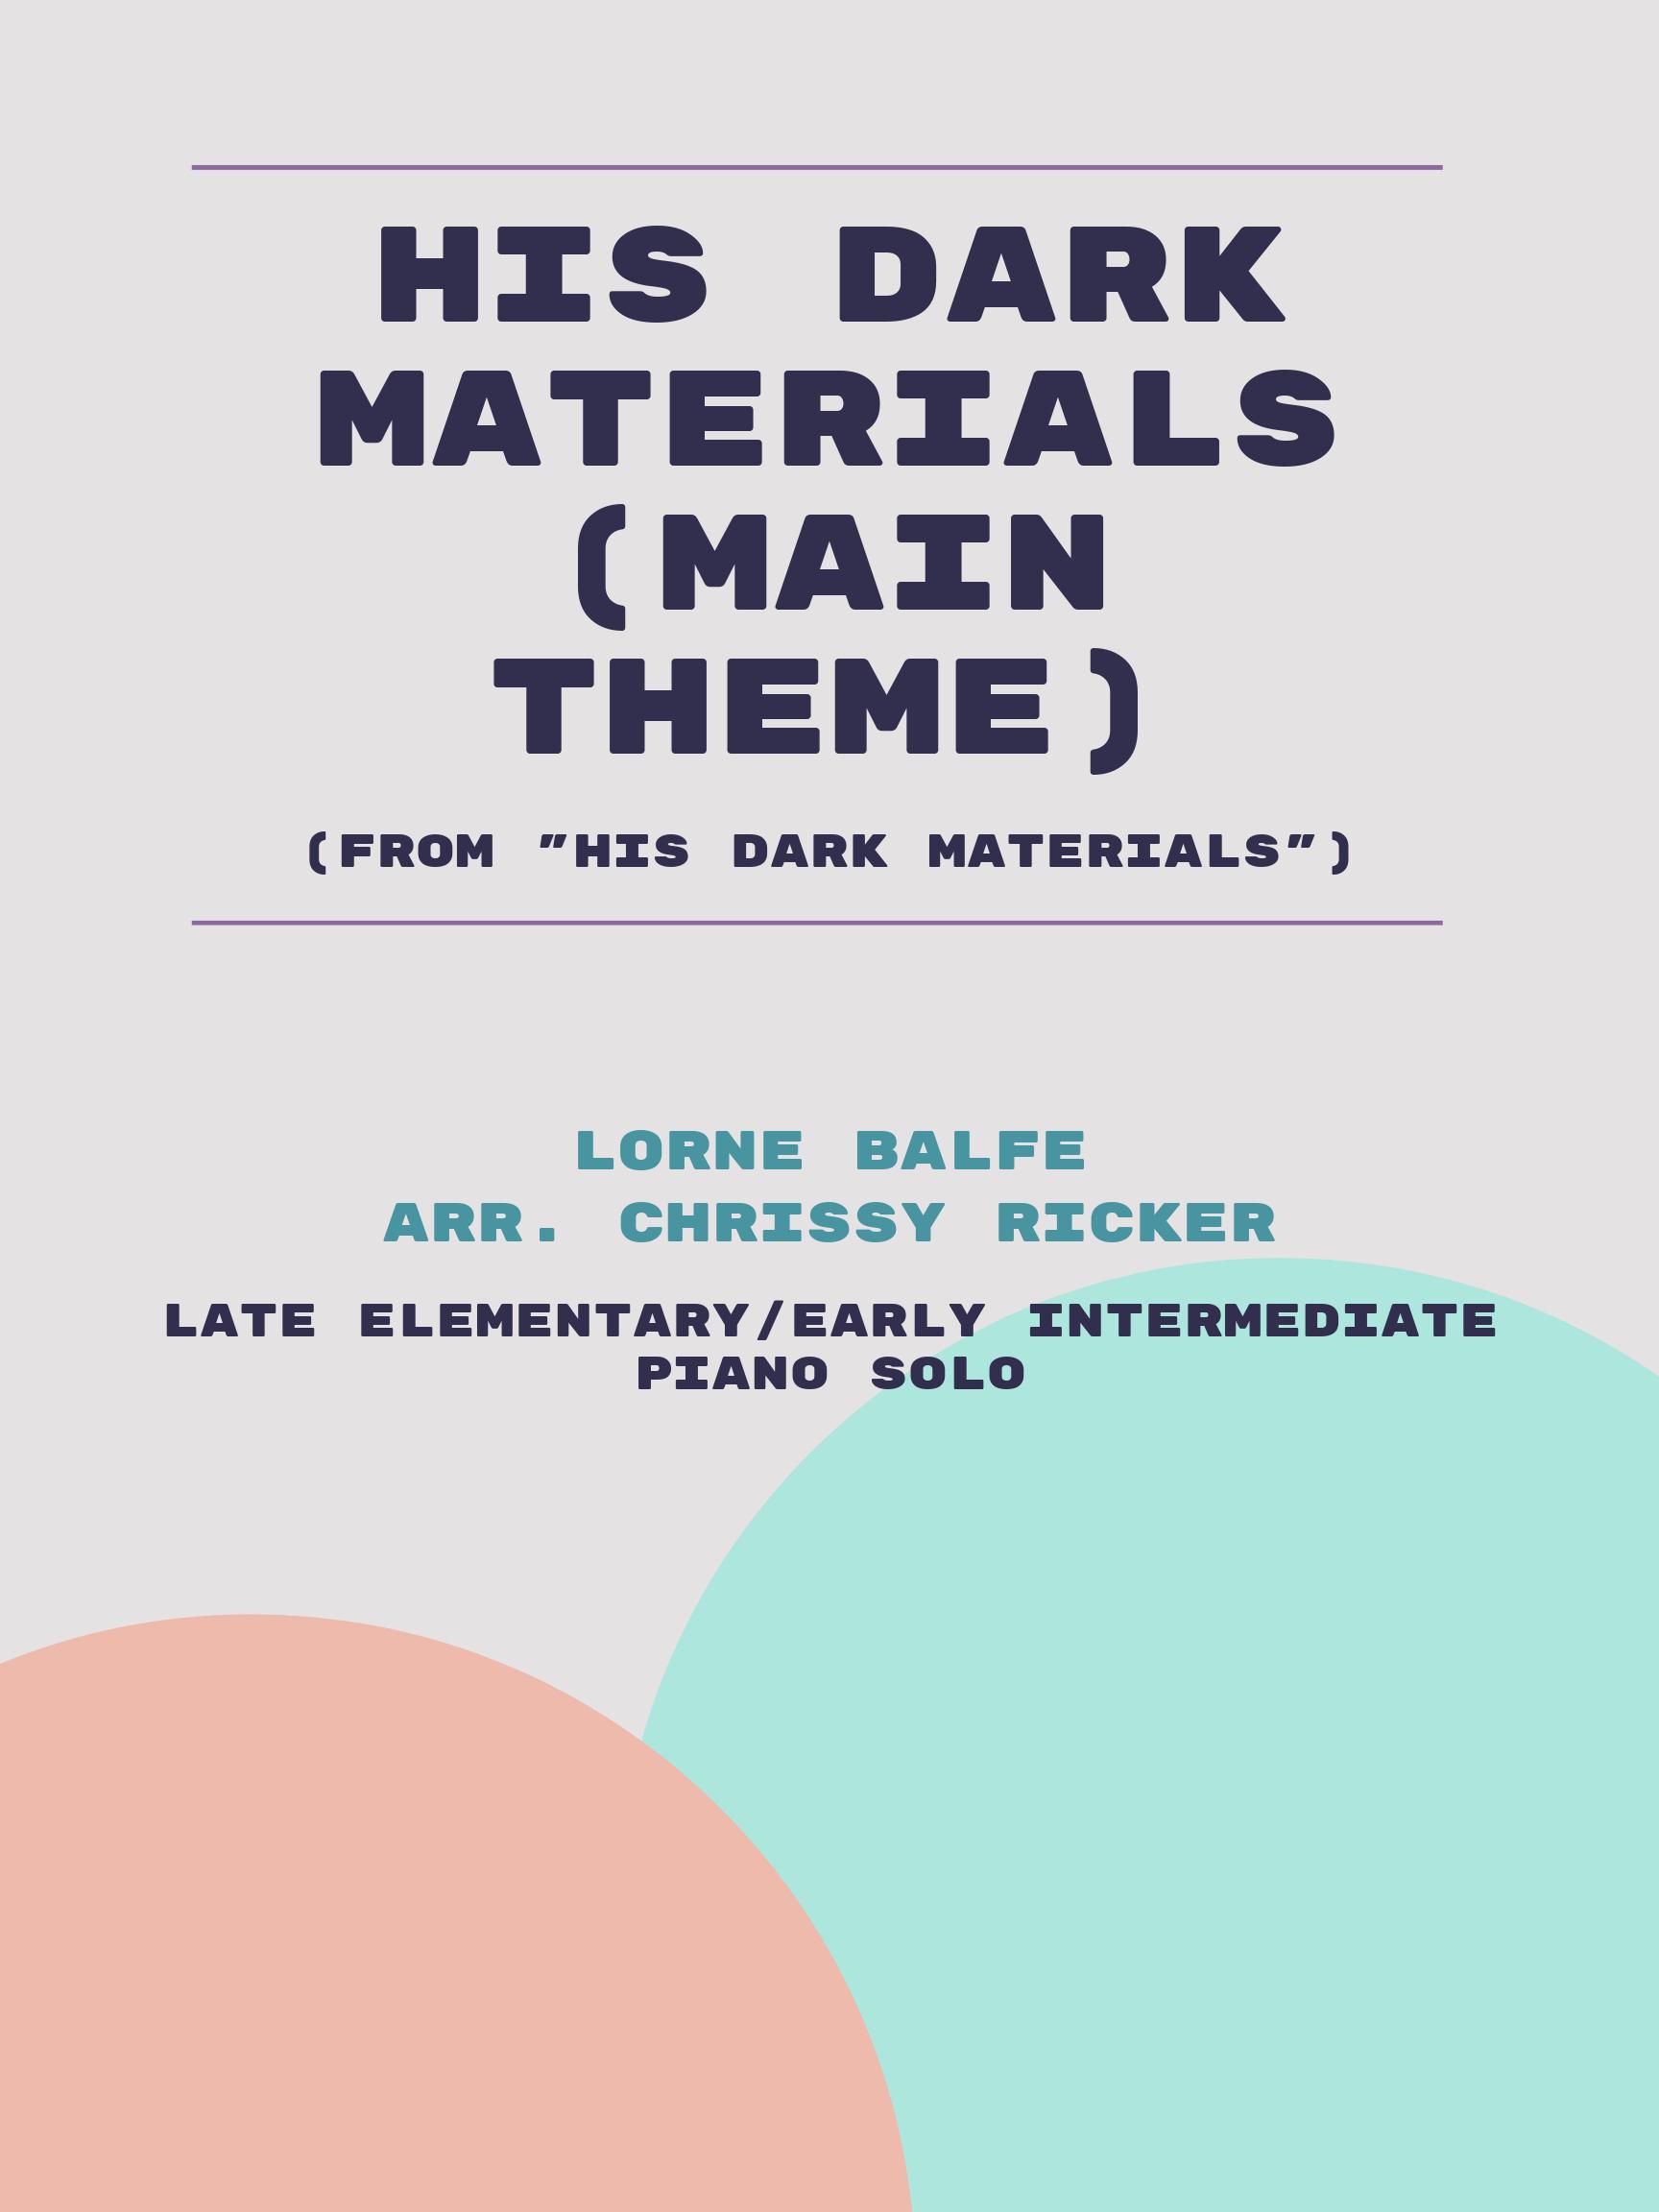 His Dark Materials (Main Theme) by Lorne Balfe